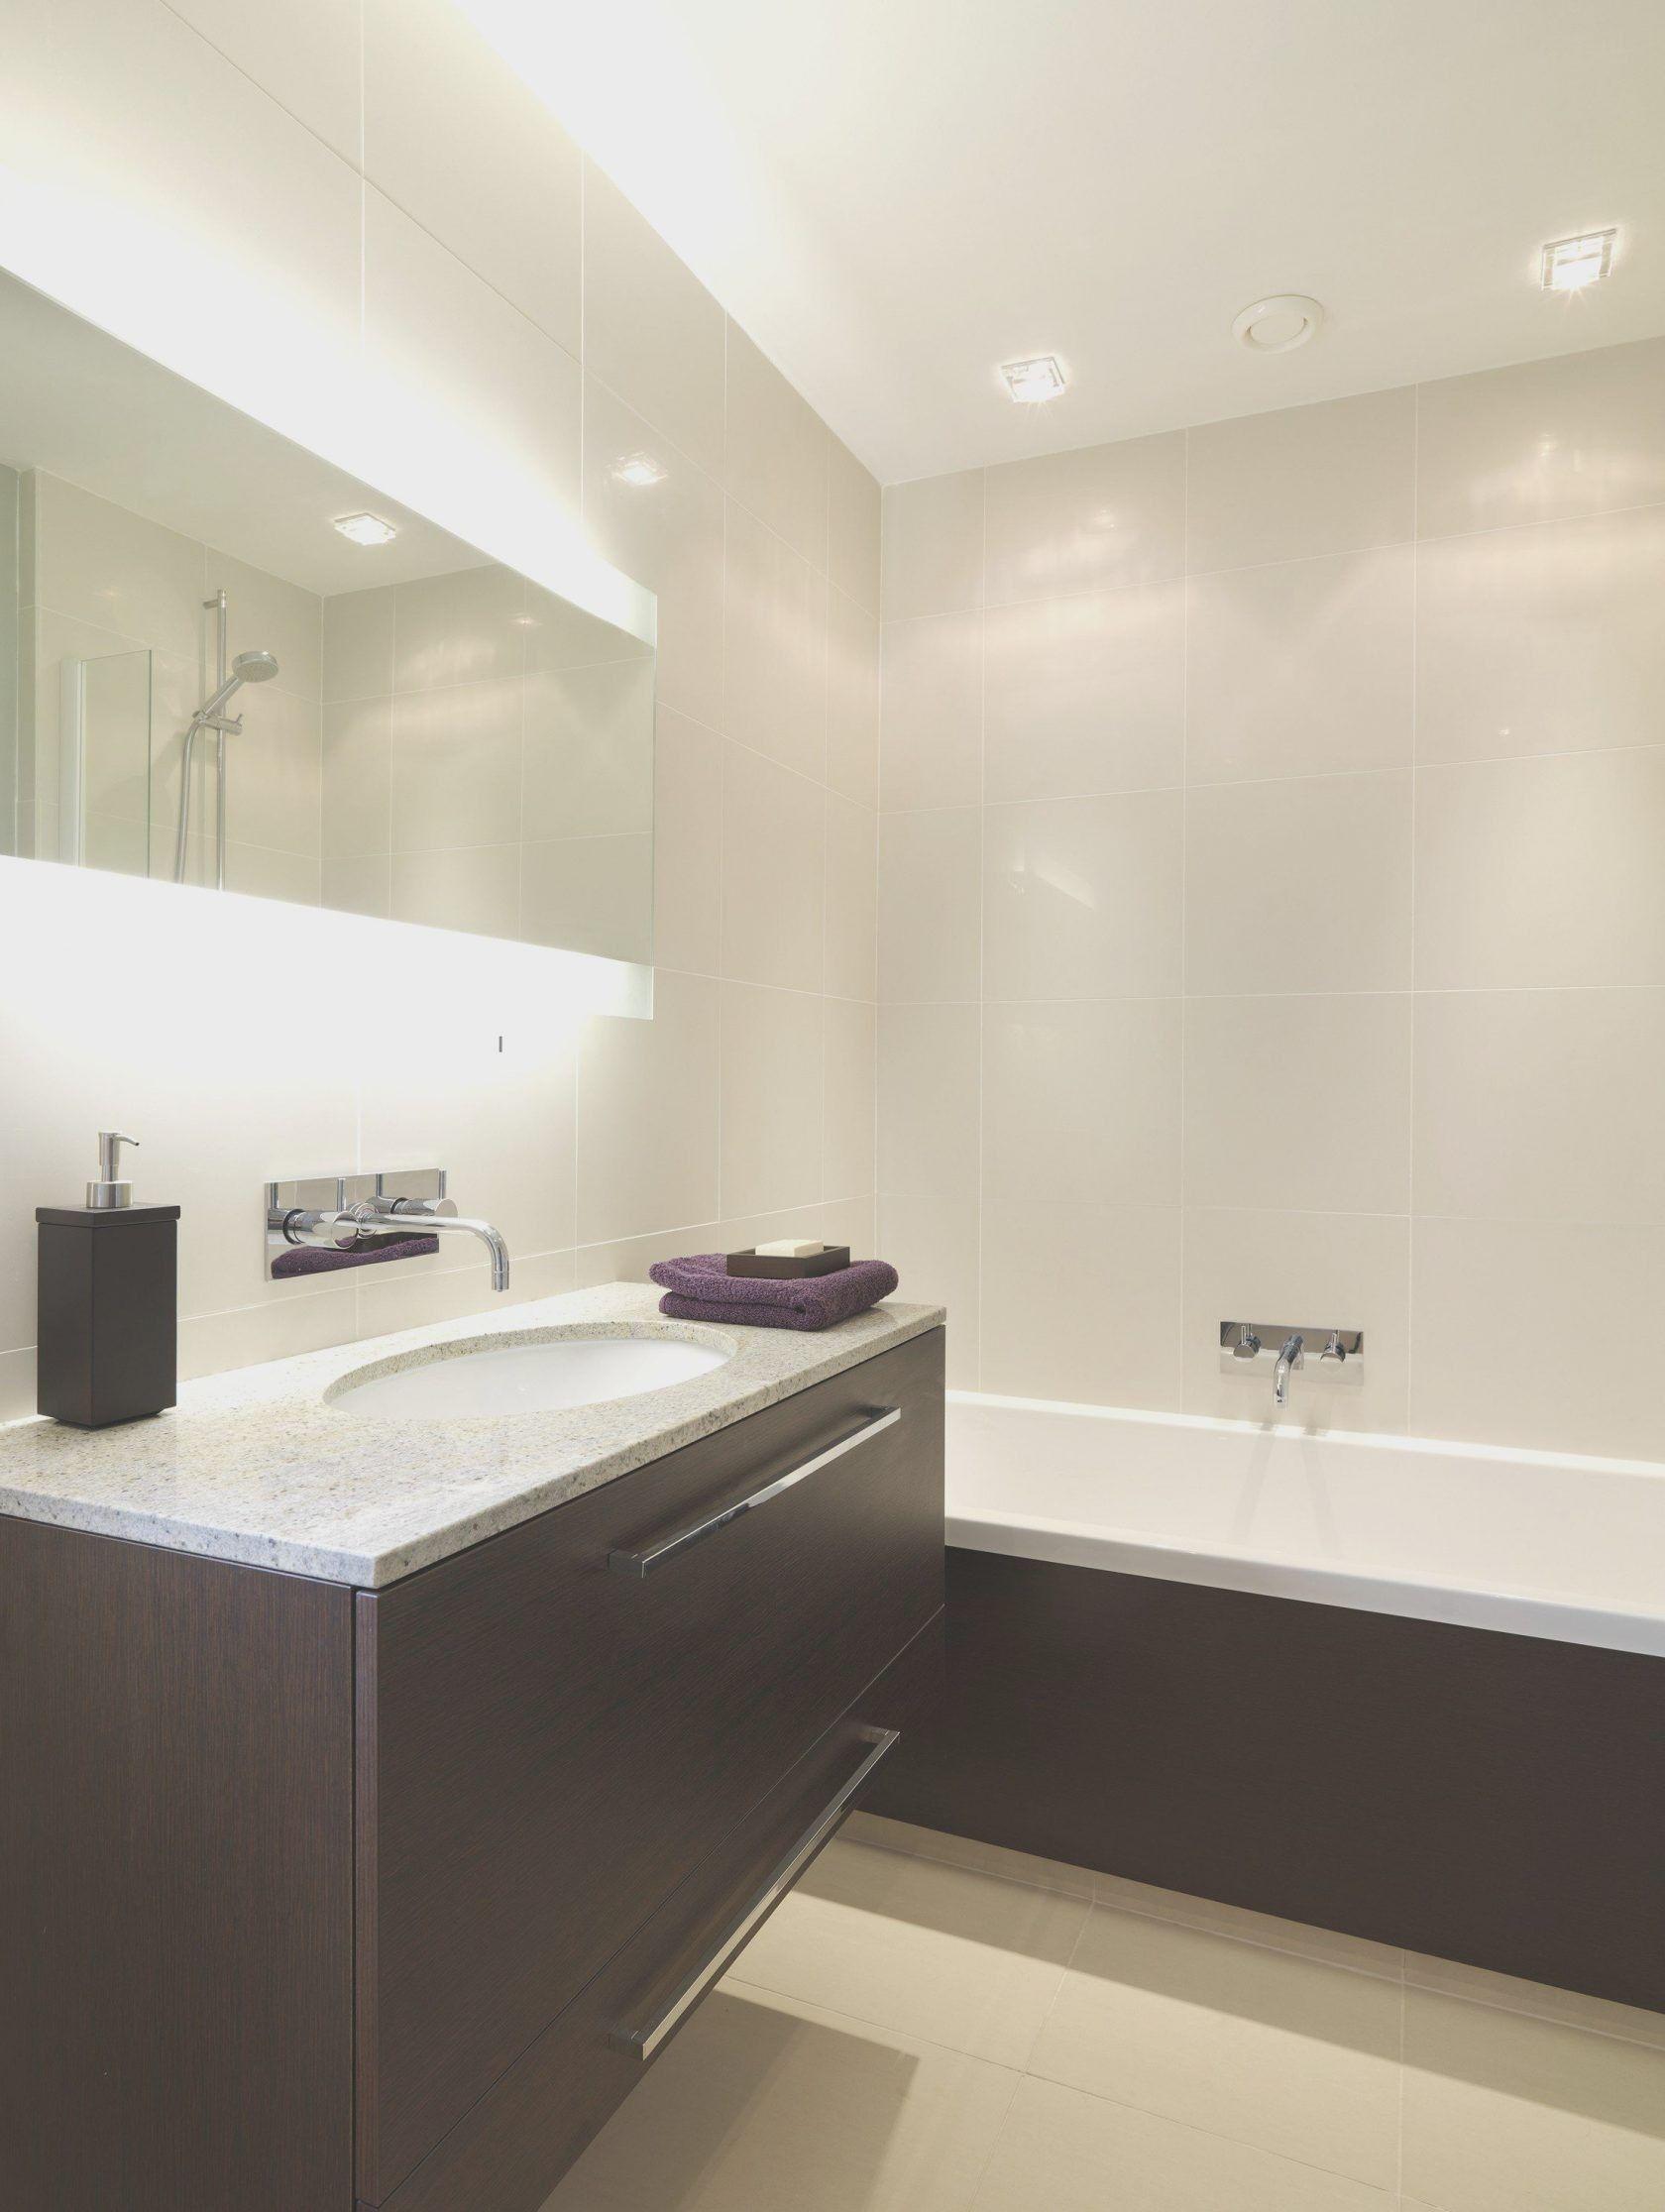 Fresh Bathroom Spotlights Zone 2 Dkbzaweb In 2019